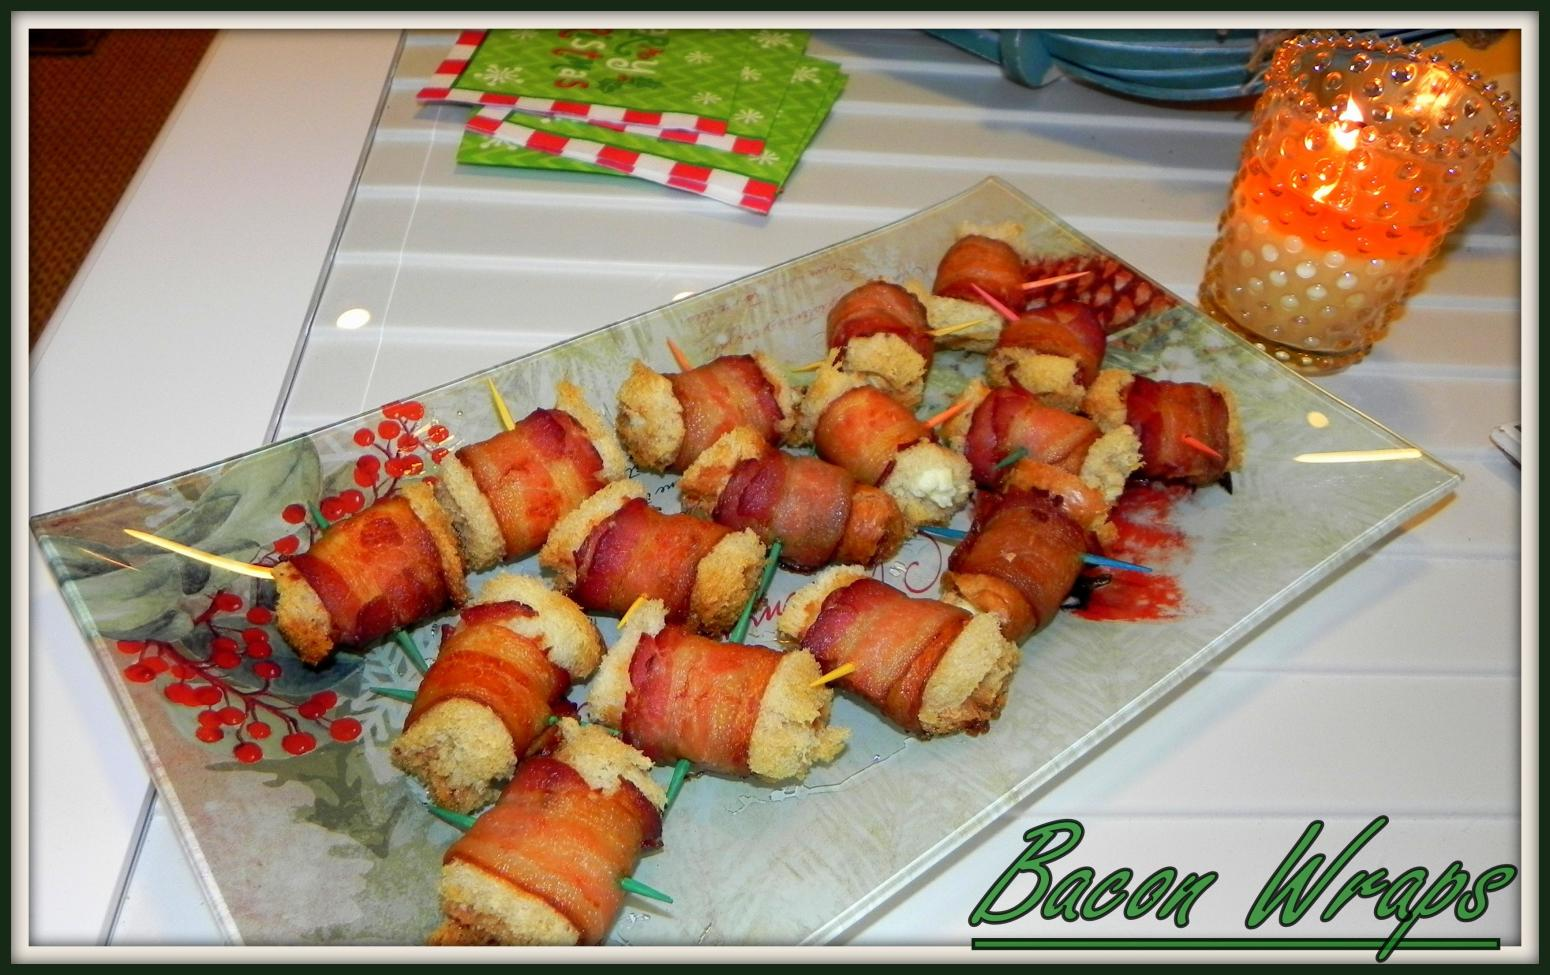 Bacon Wraps Recipe